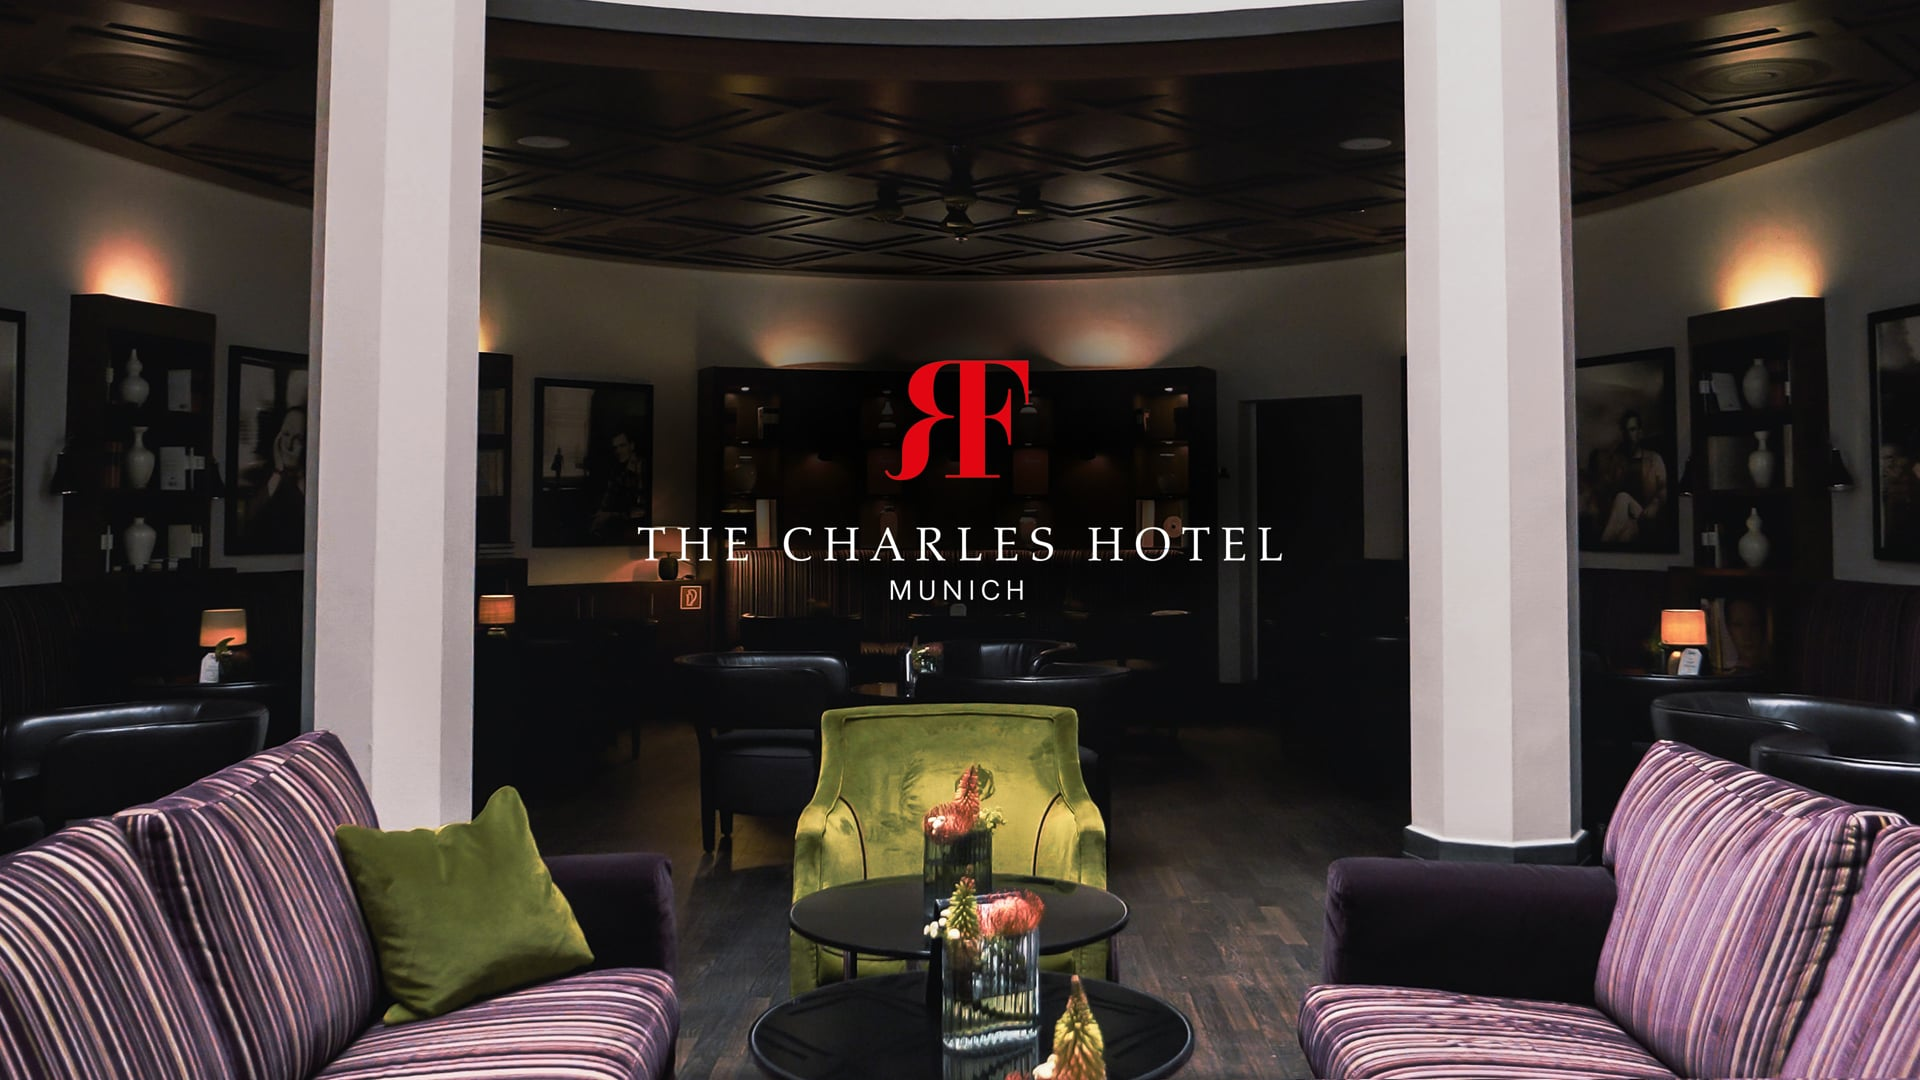 Hotelfilm: The Charles Hotel